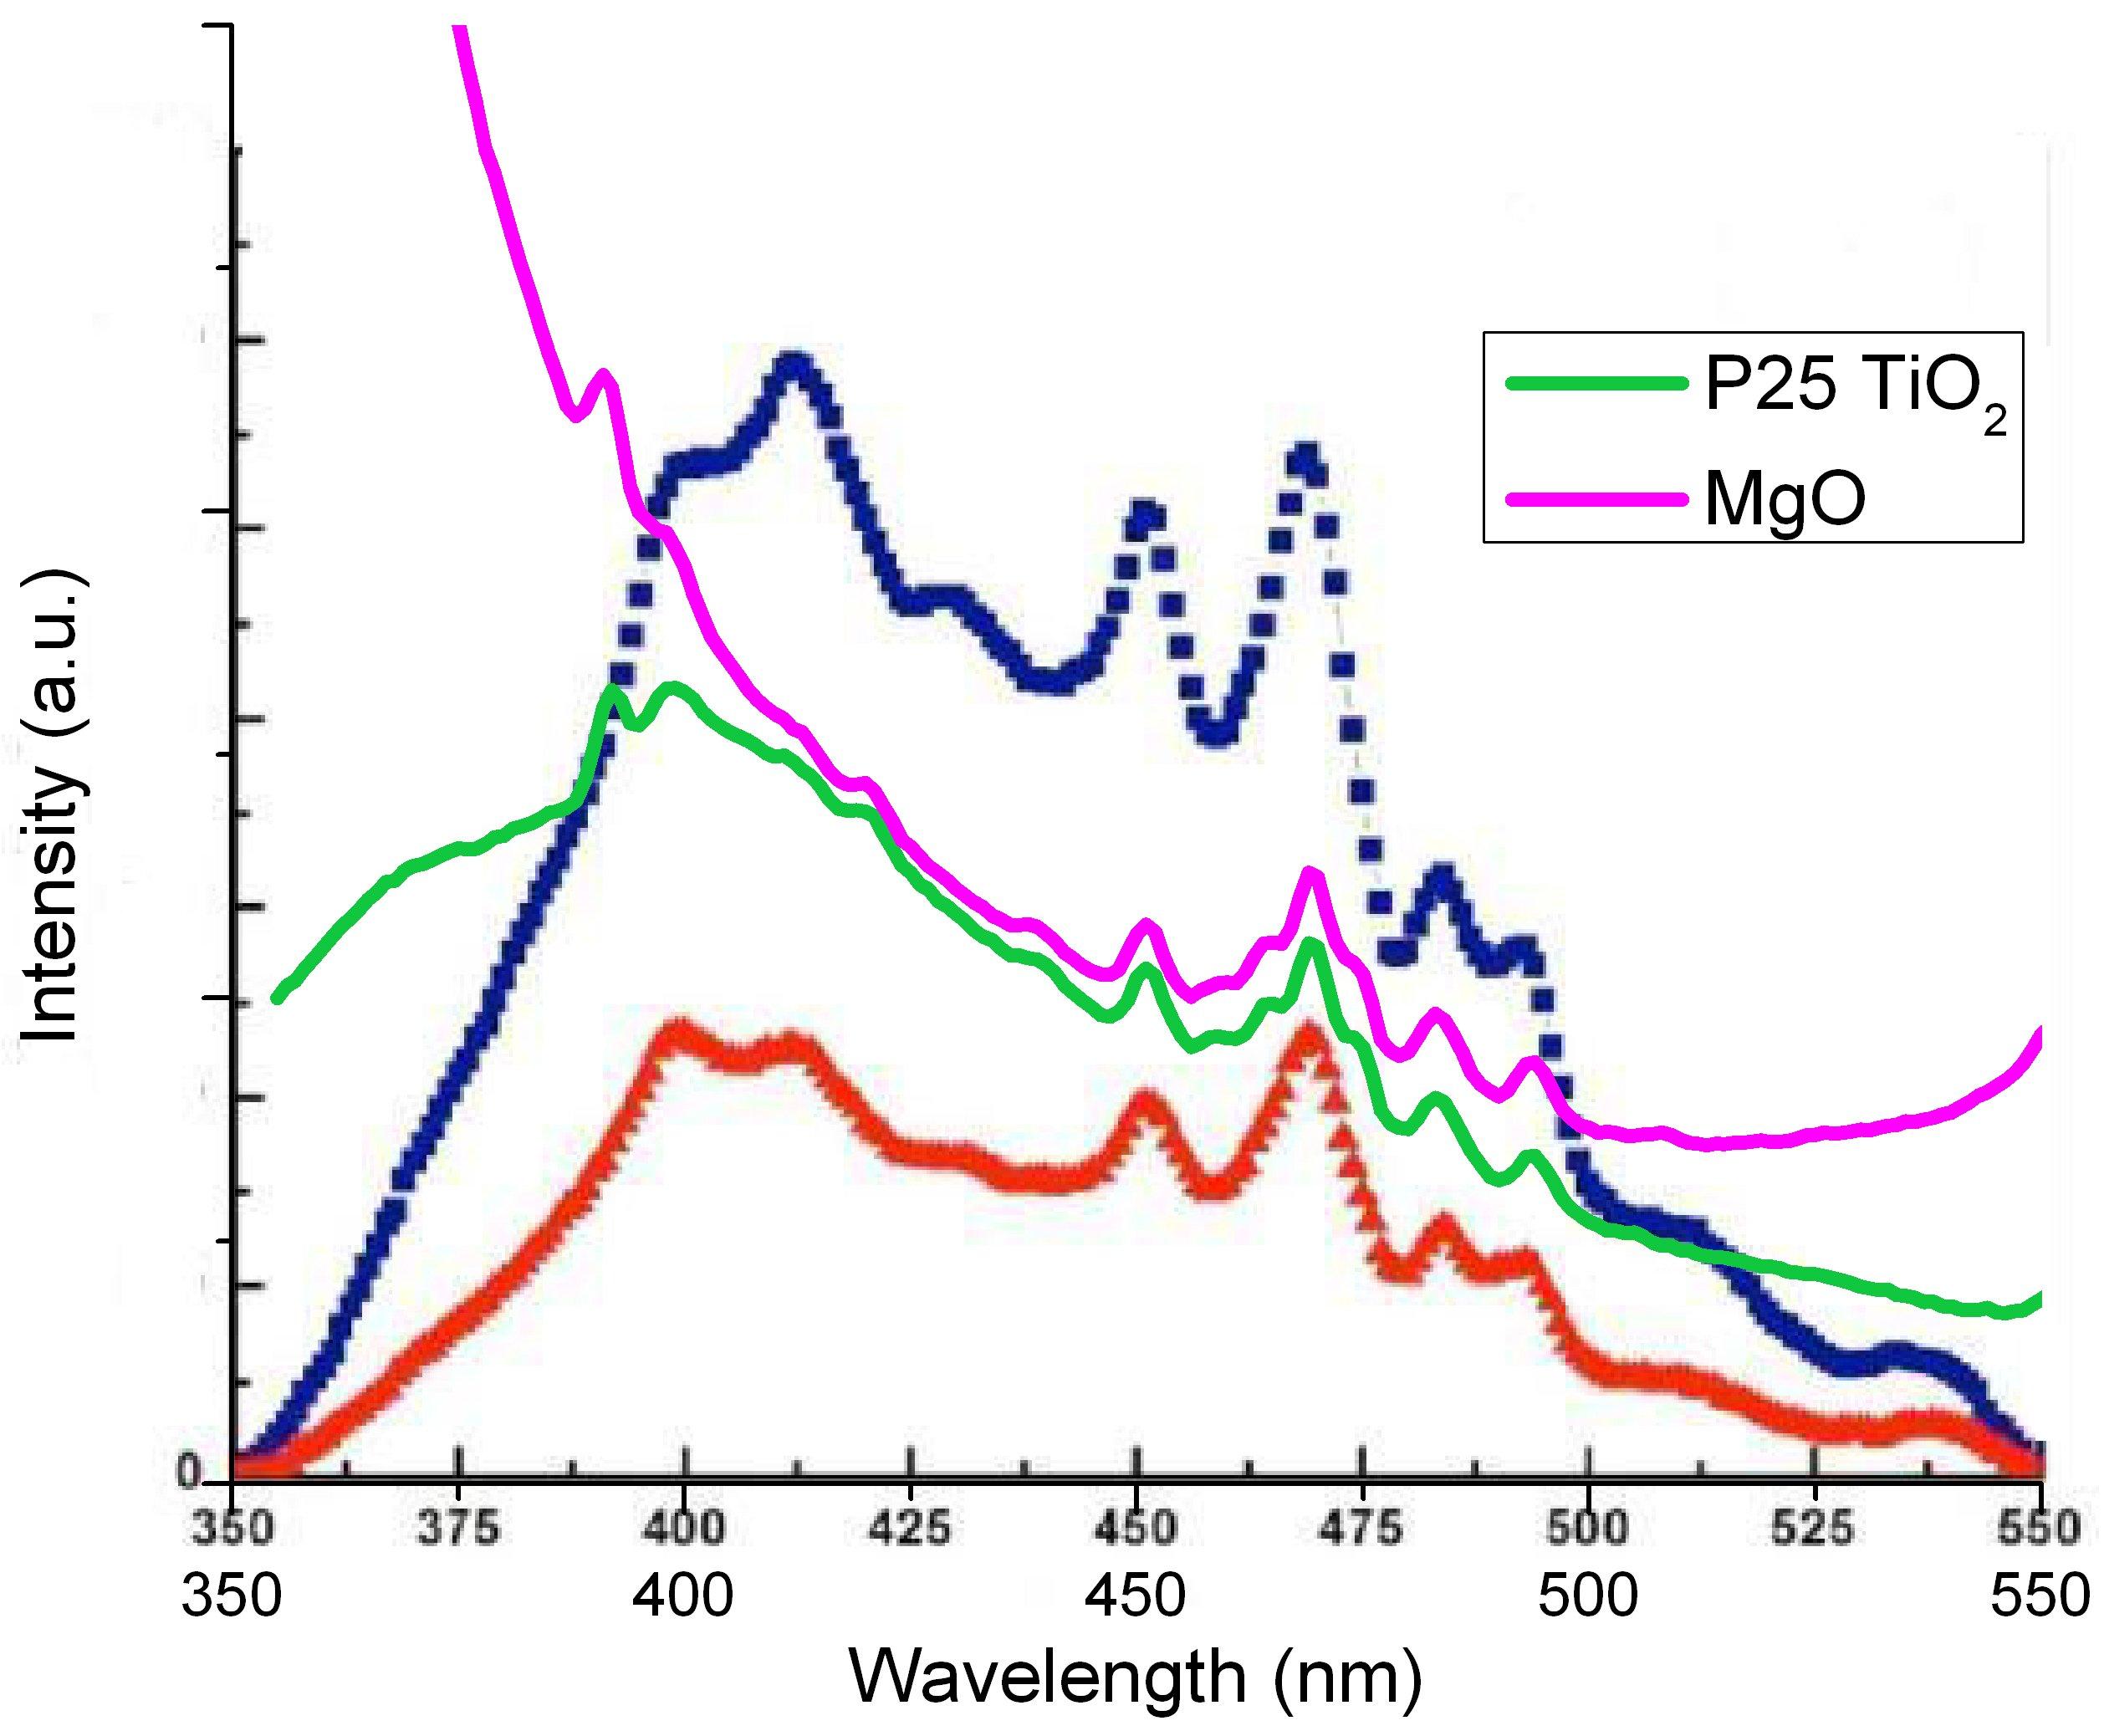 Spectro-electrochemical measurements